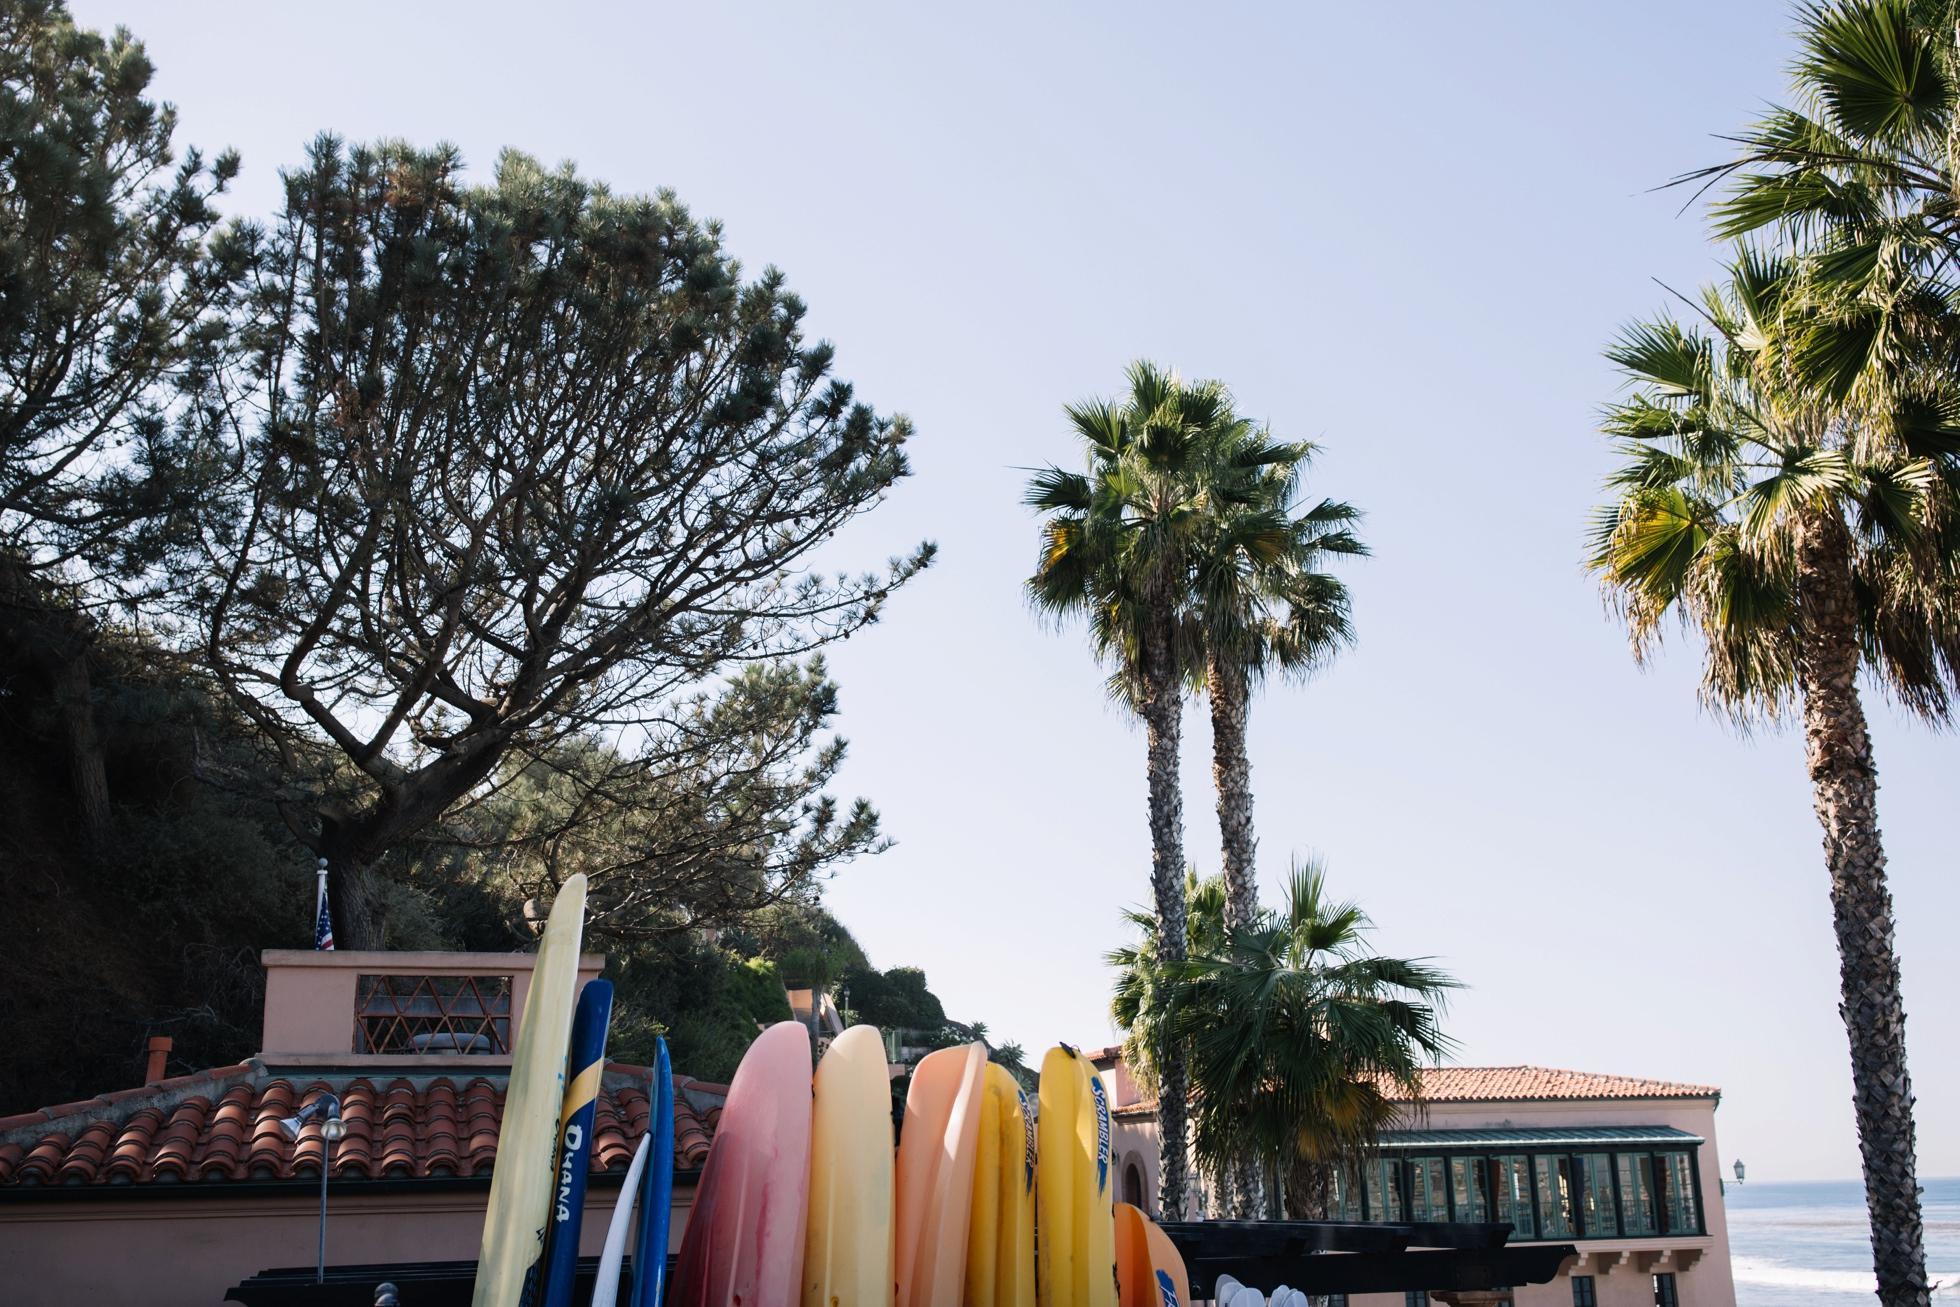 0009-la-south-bay-california-travel-photography-torrance-ca